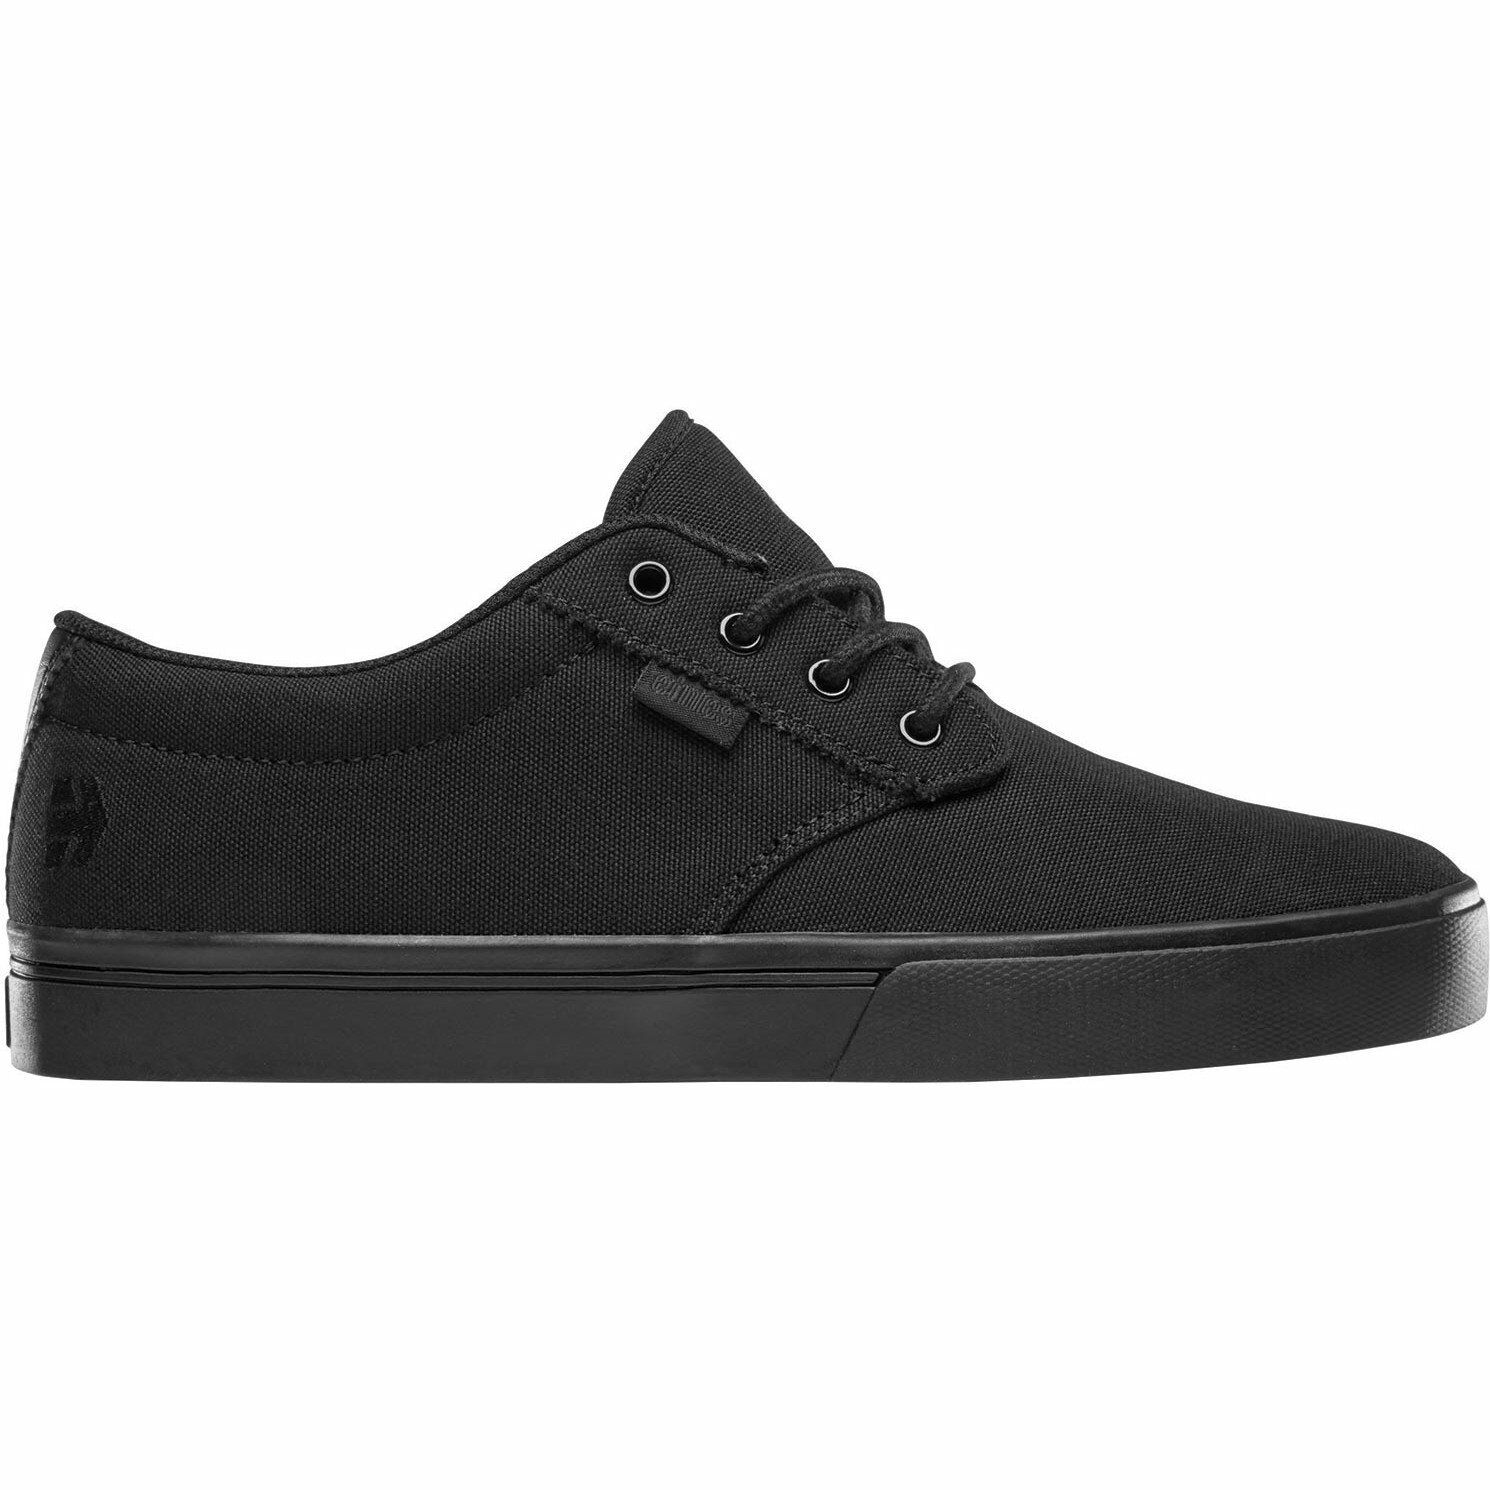 Etnies Jameson 2 Footwear shoes - Black All Sizes